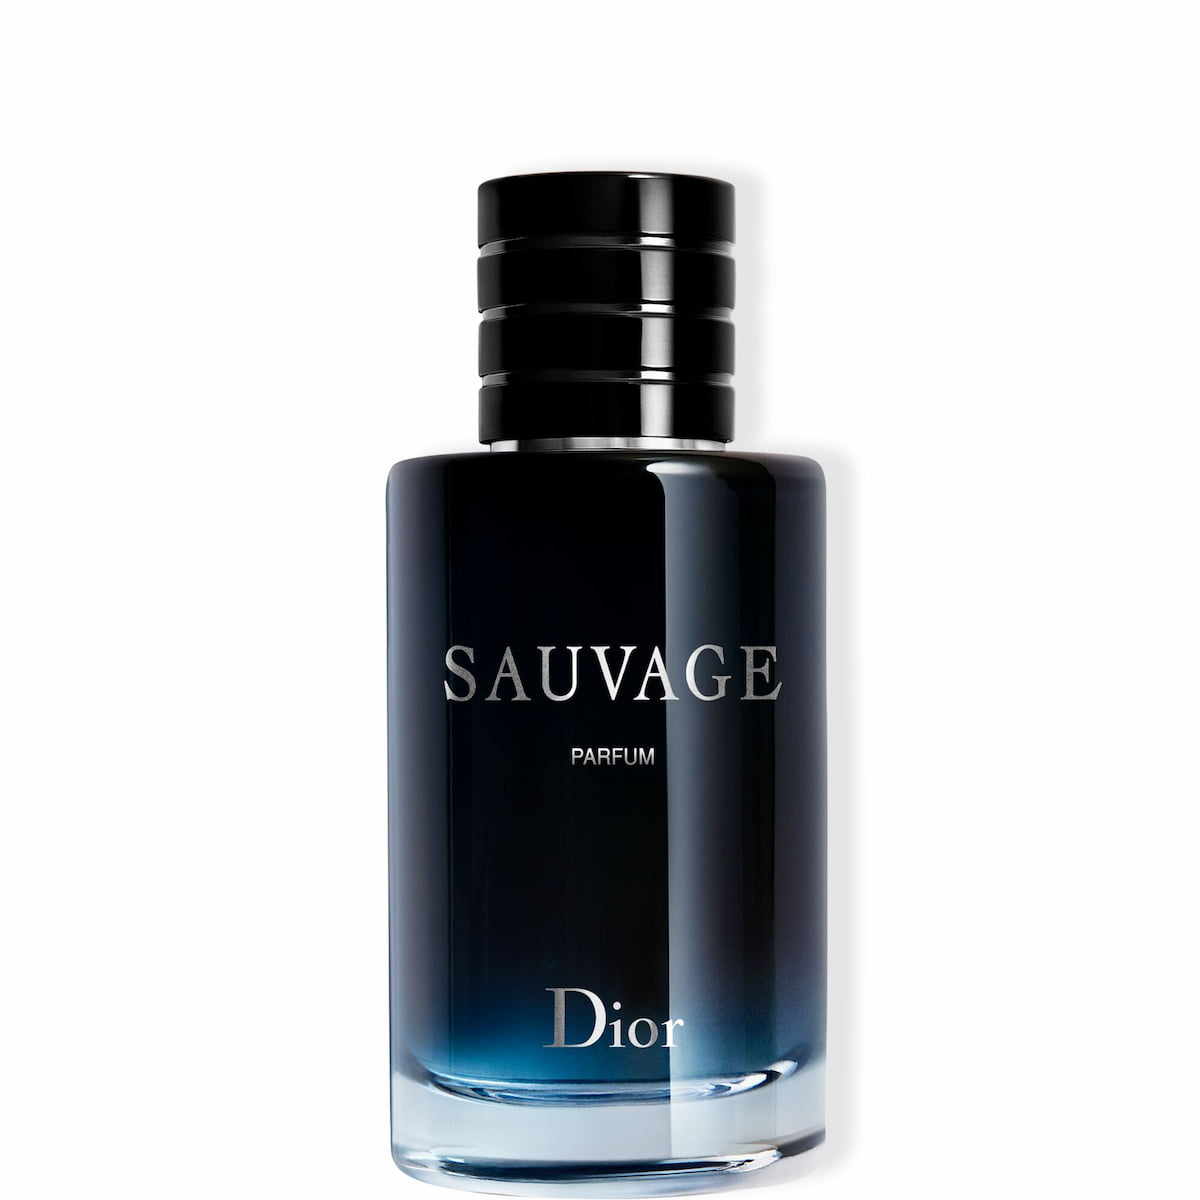 Sauvage Parfum - DIOR